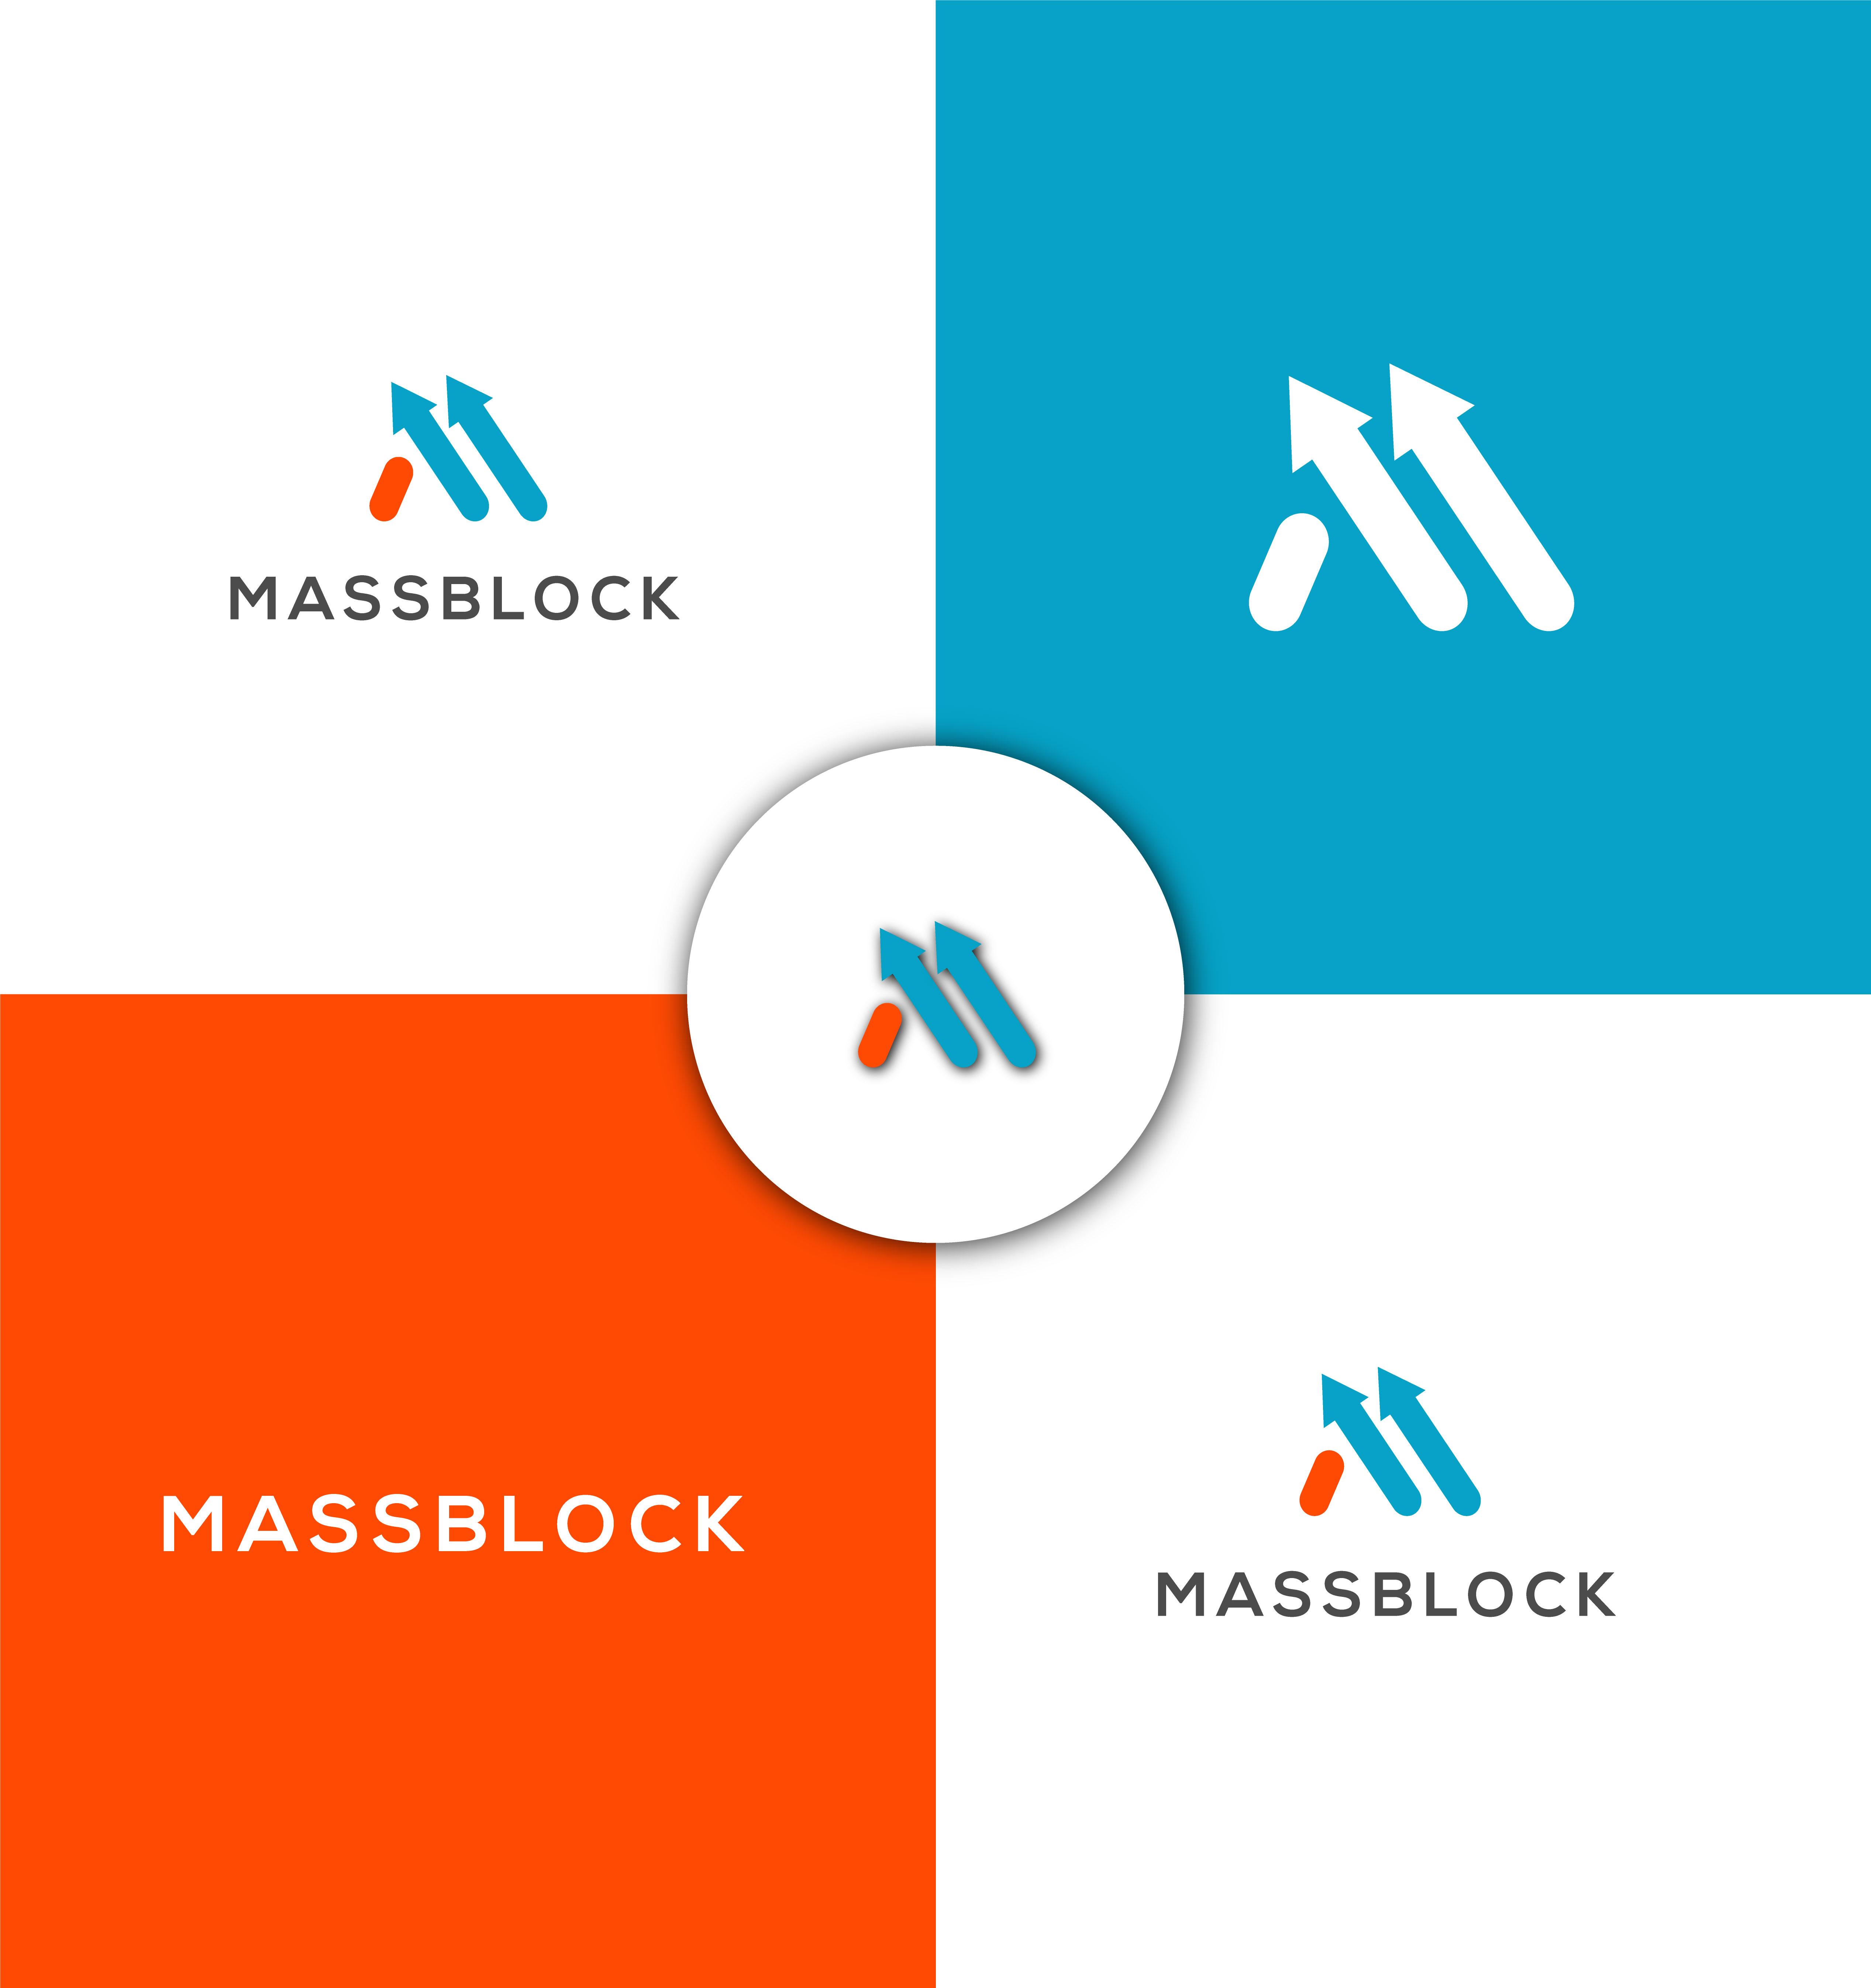 Logo Design by Robiul Robin - Entry No. 106 in the Logo Design Contest Fun Logo Design for Massblock.